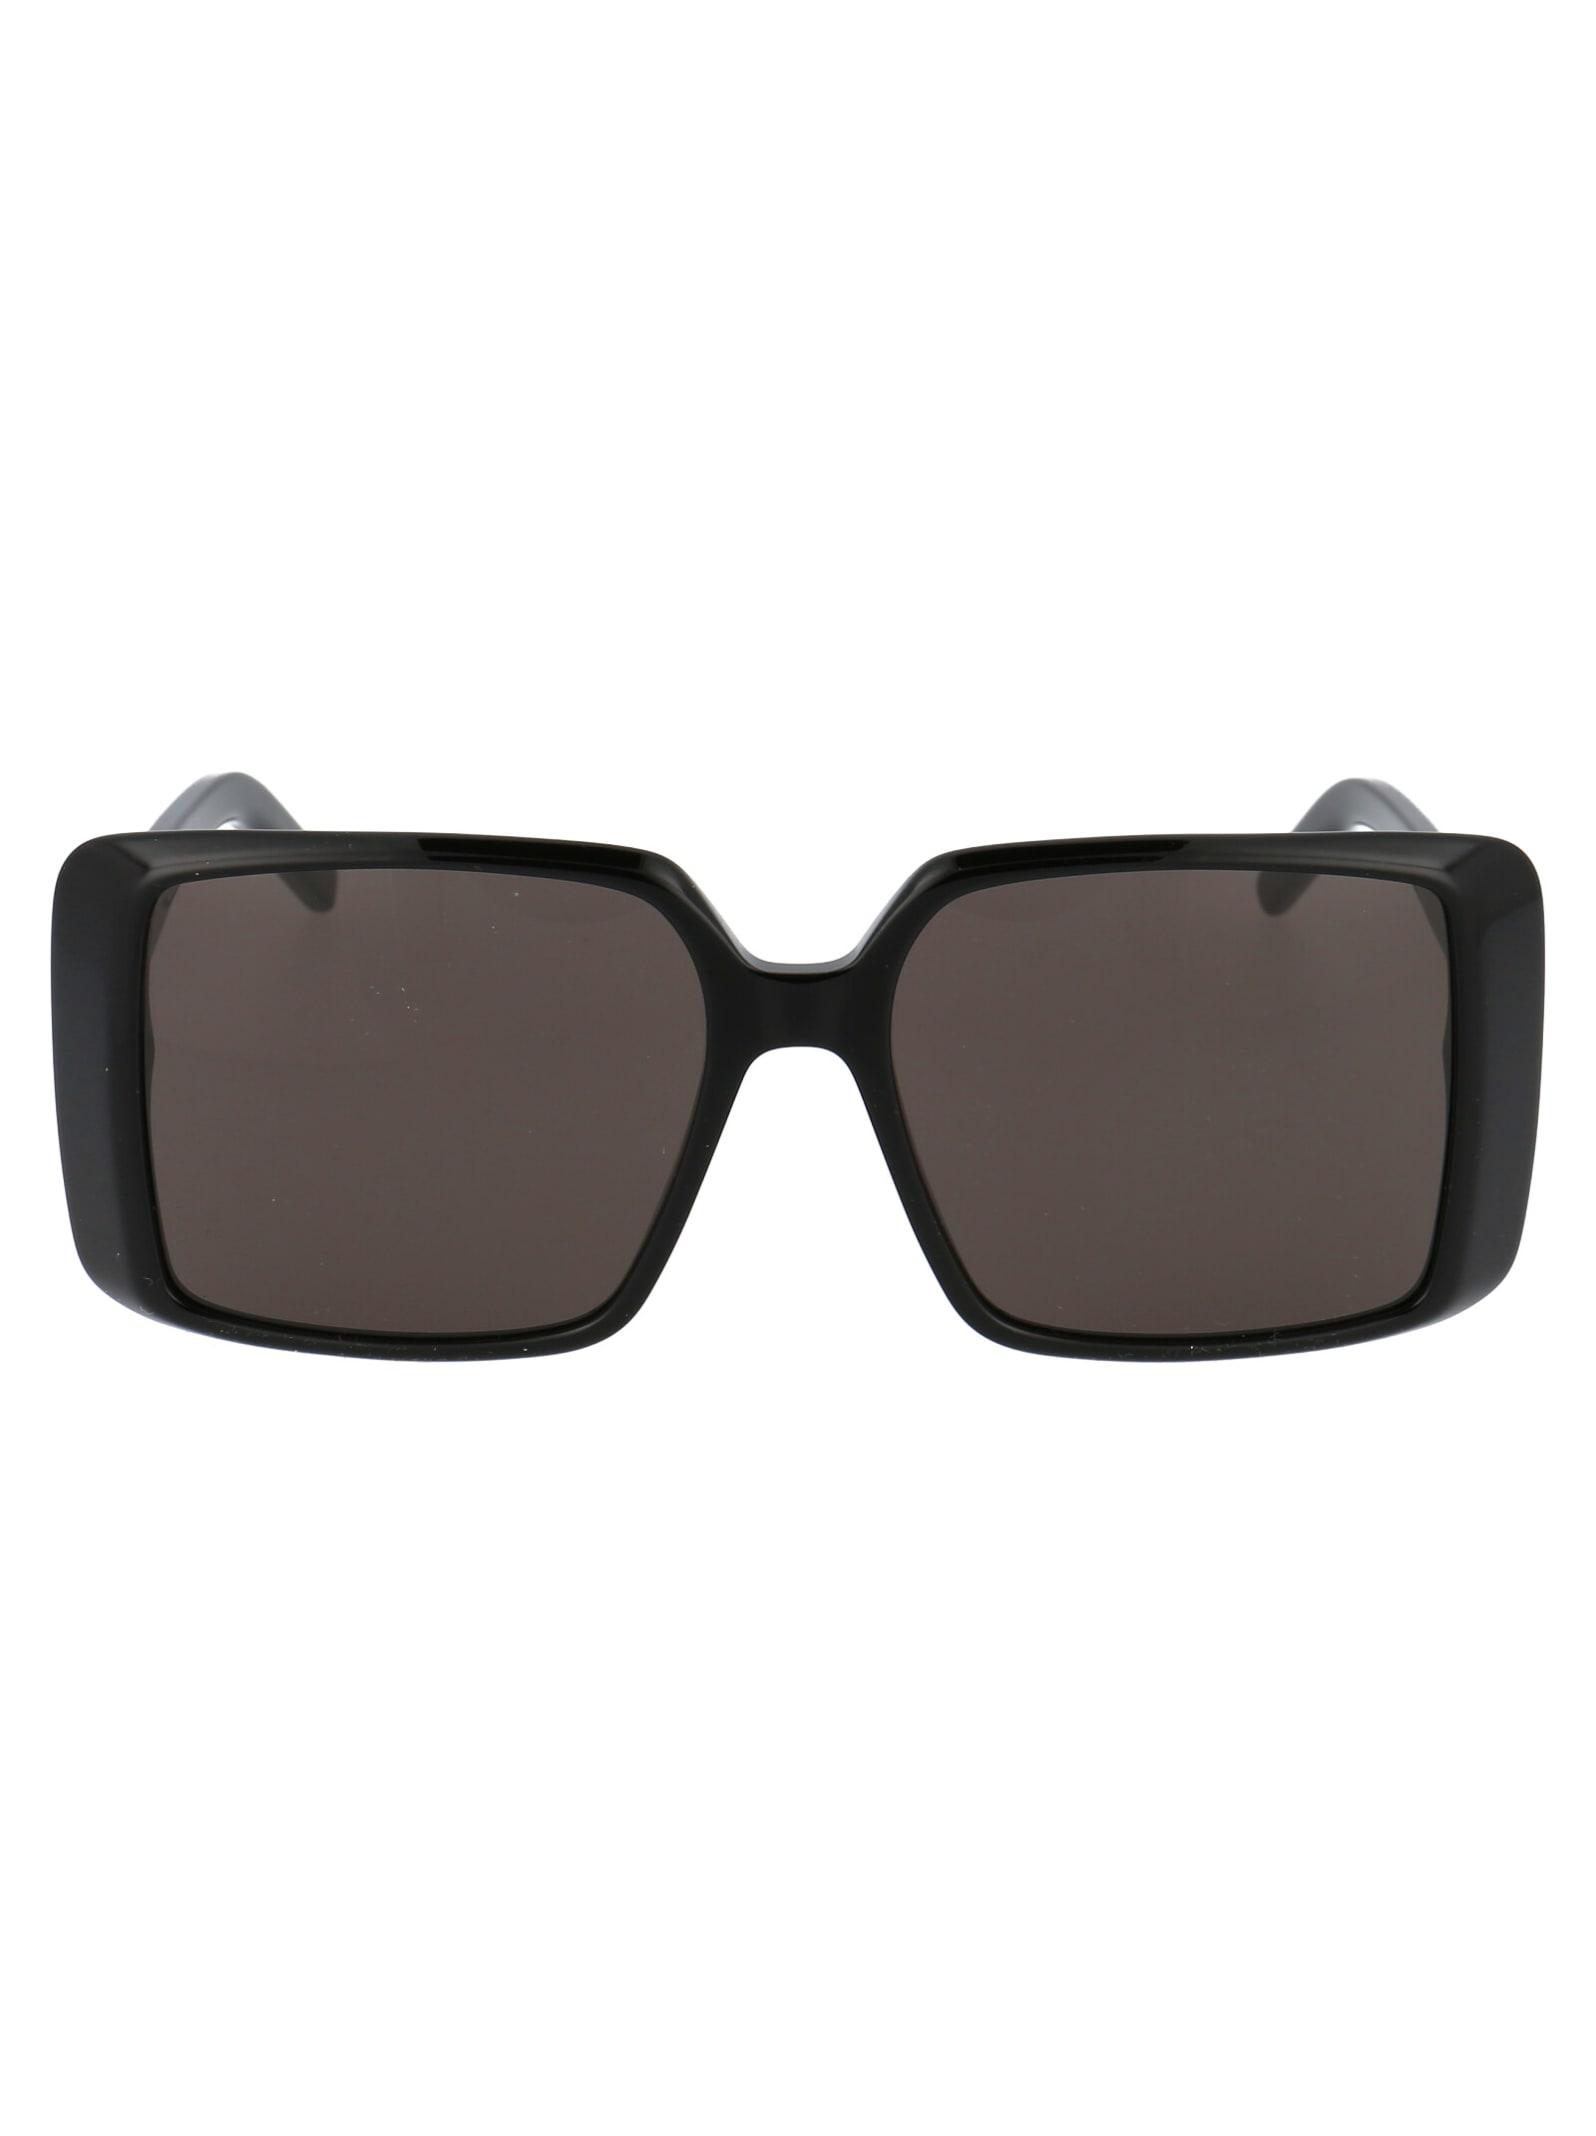 Saint Laurent Sl 451 Sunglasses